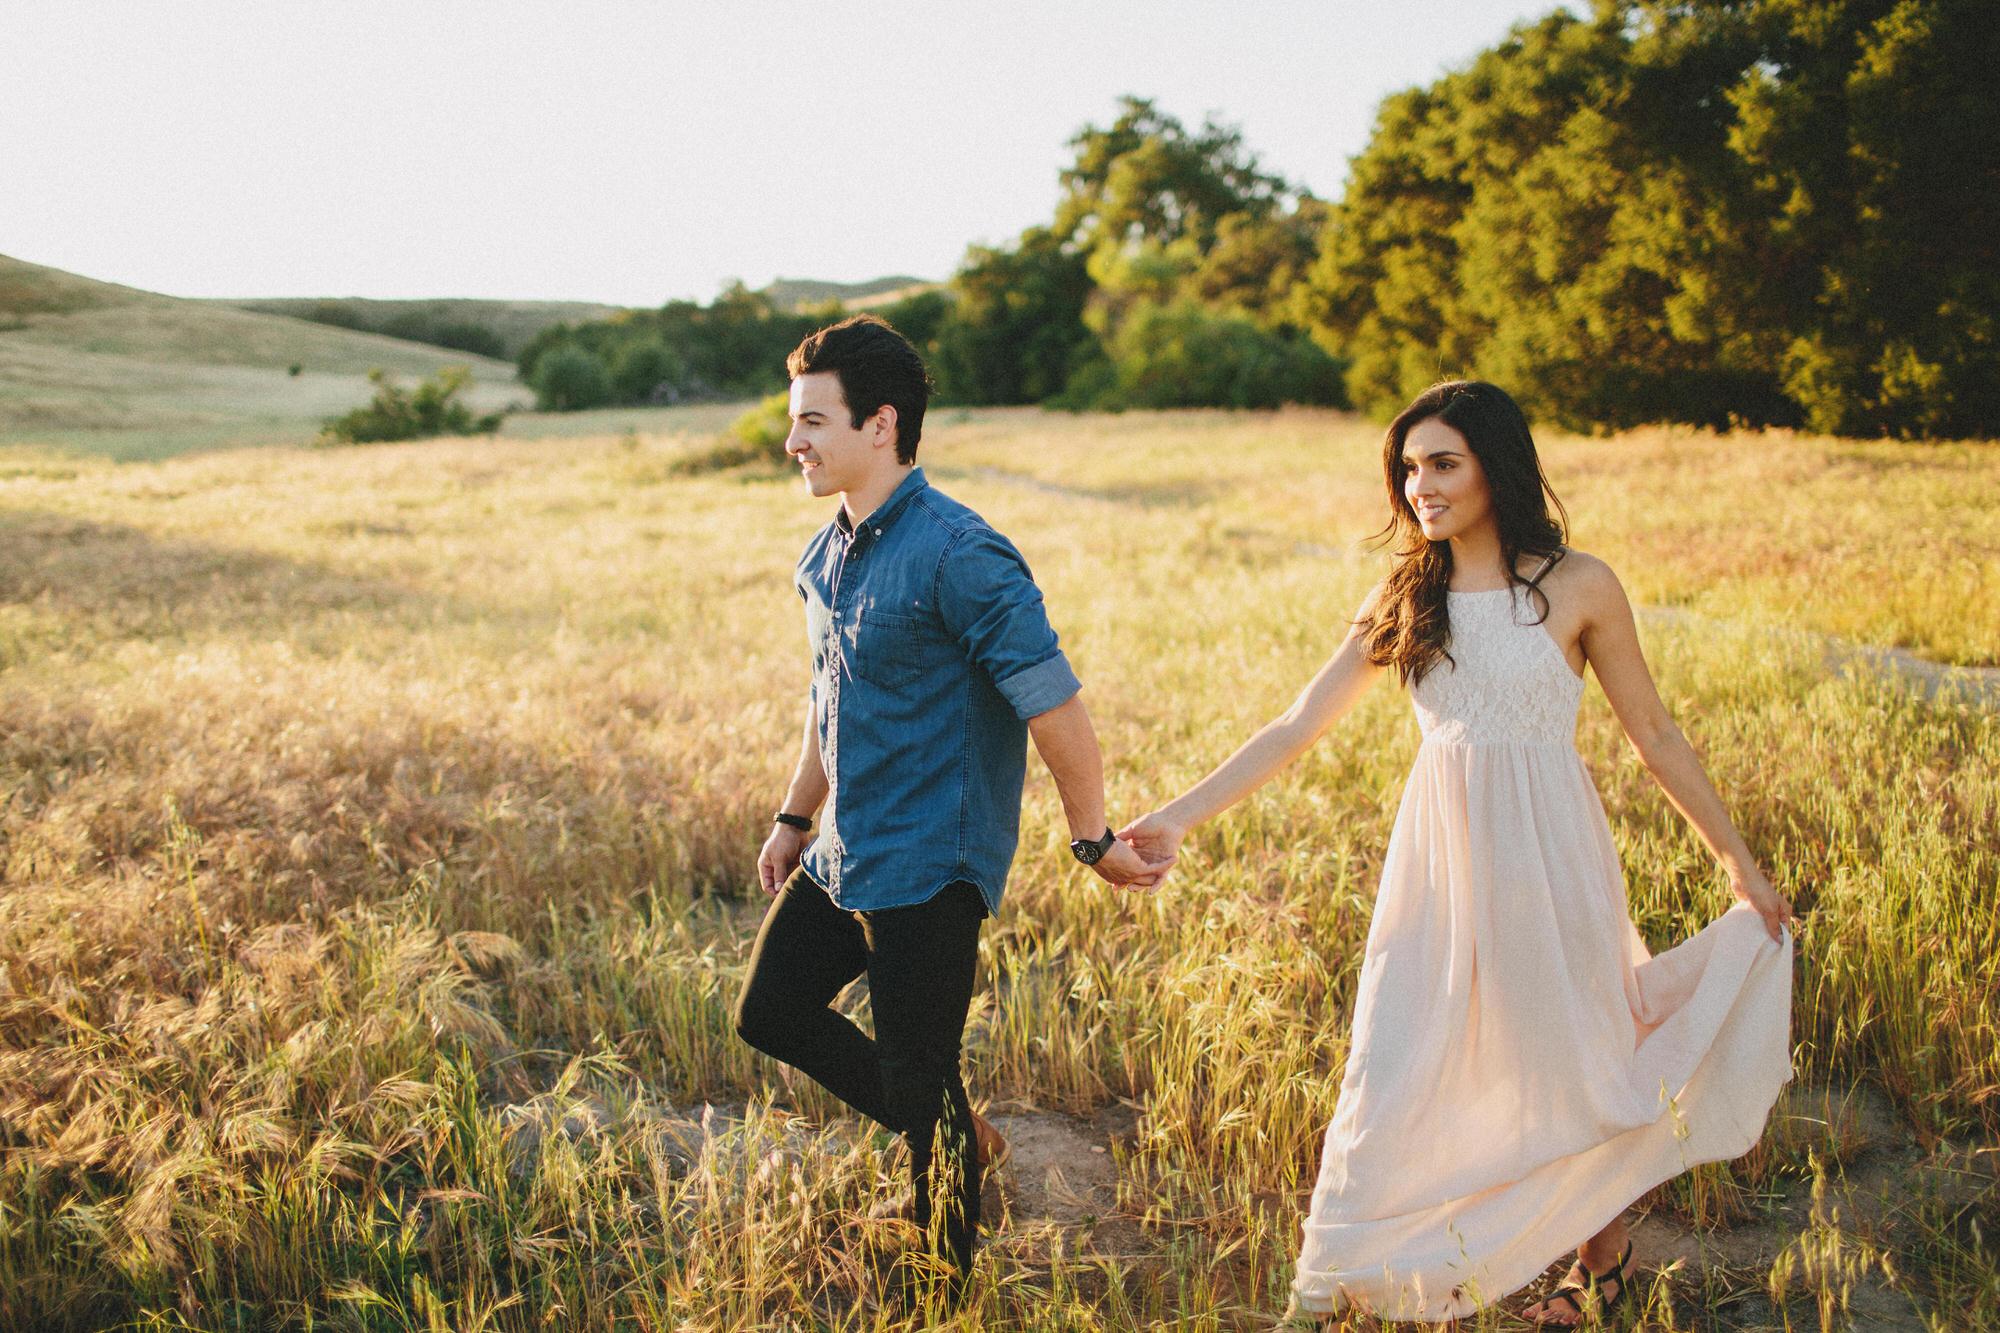 romantic-engagement-18.jpg